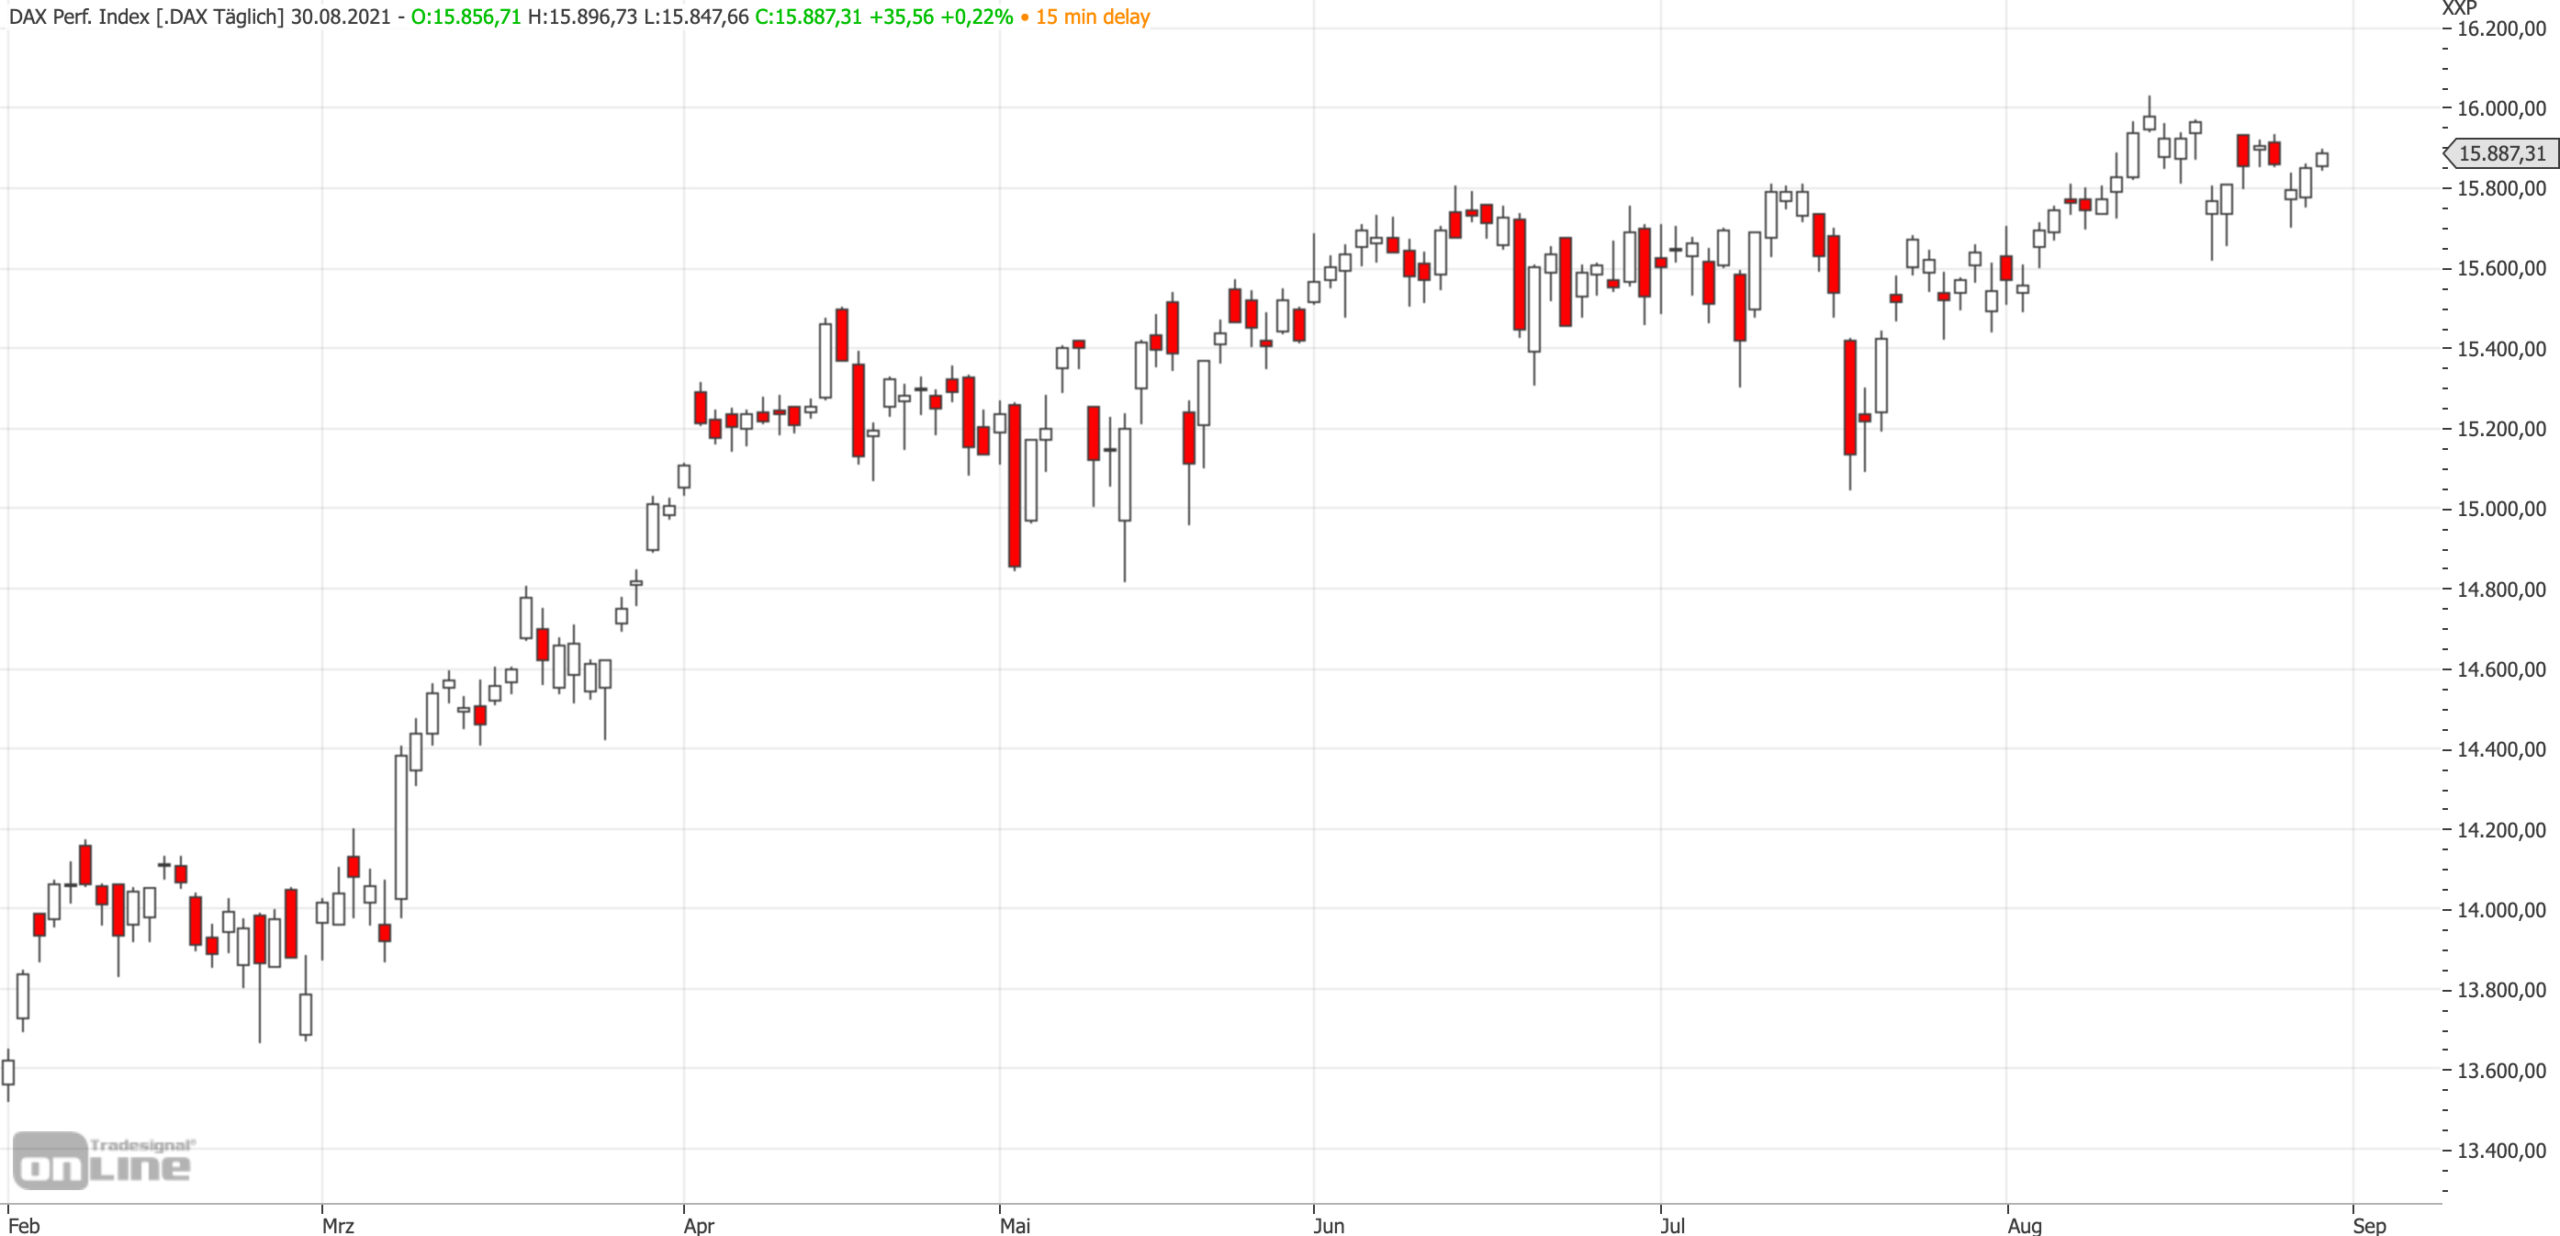 Mittelfristiger DAX-Chart am 30.08.2021